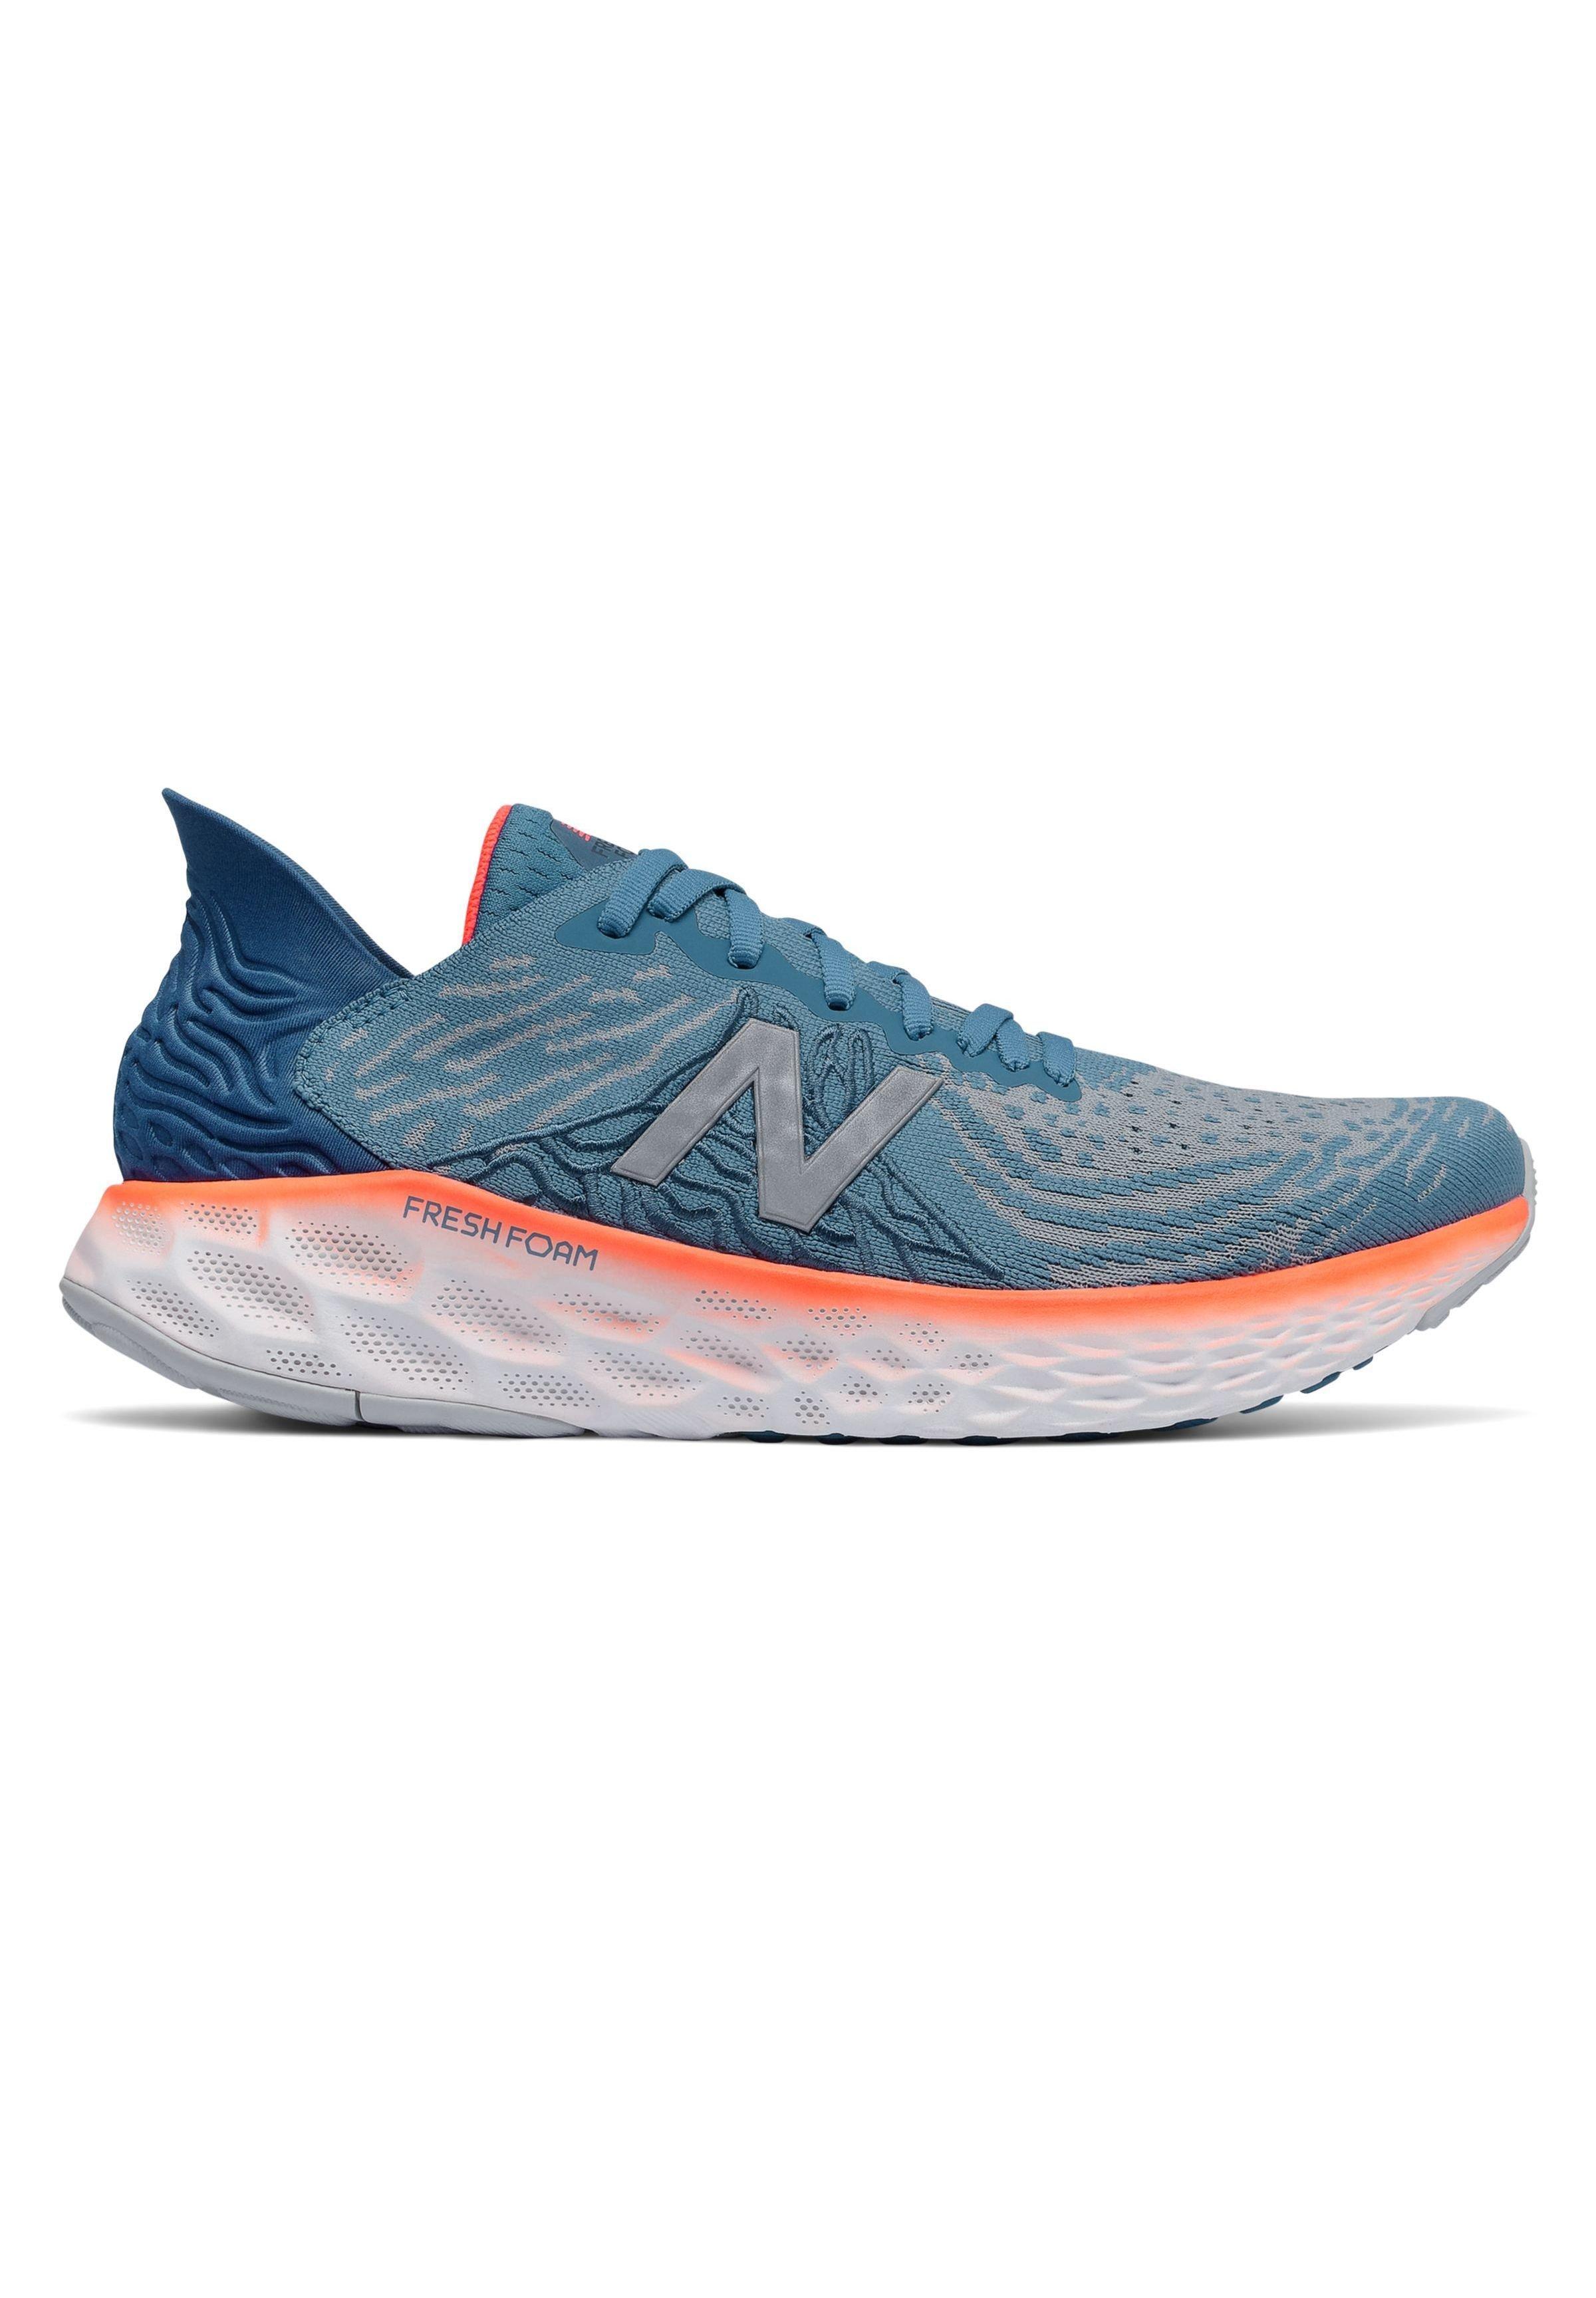 FRESH FOAM 1080 V10 - Chaussures de running neutres - nb light blue/dynamite